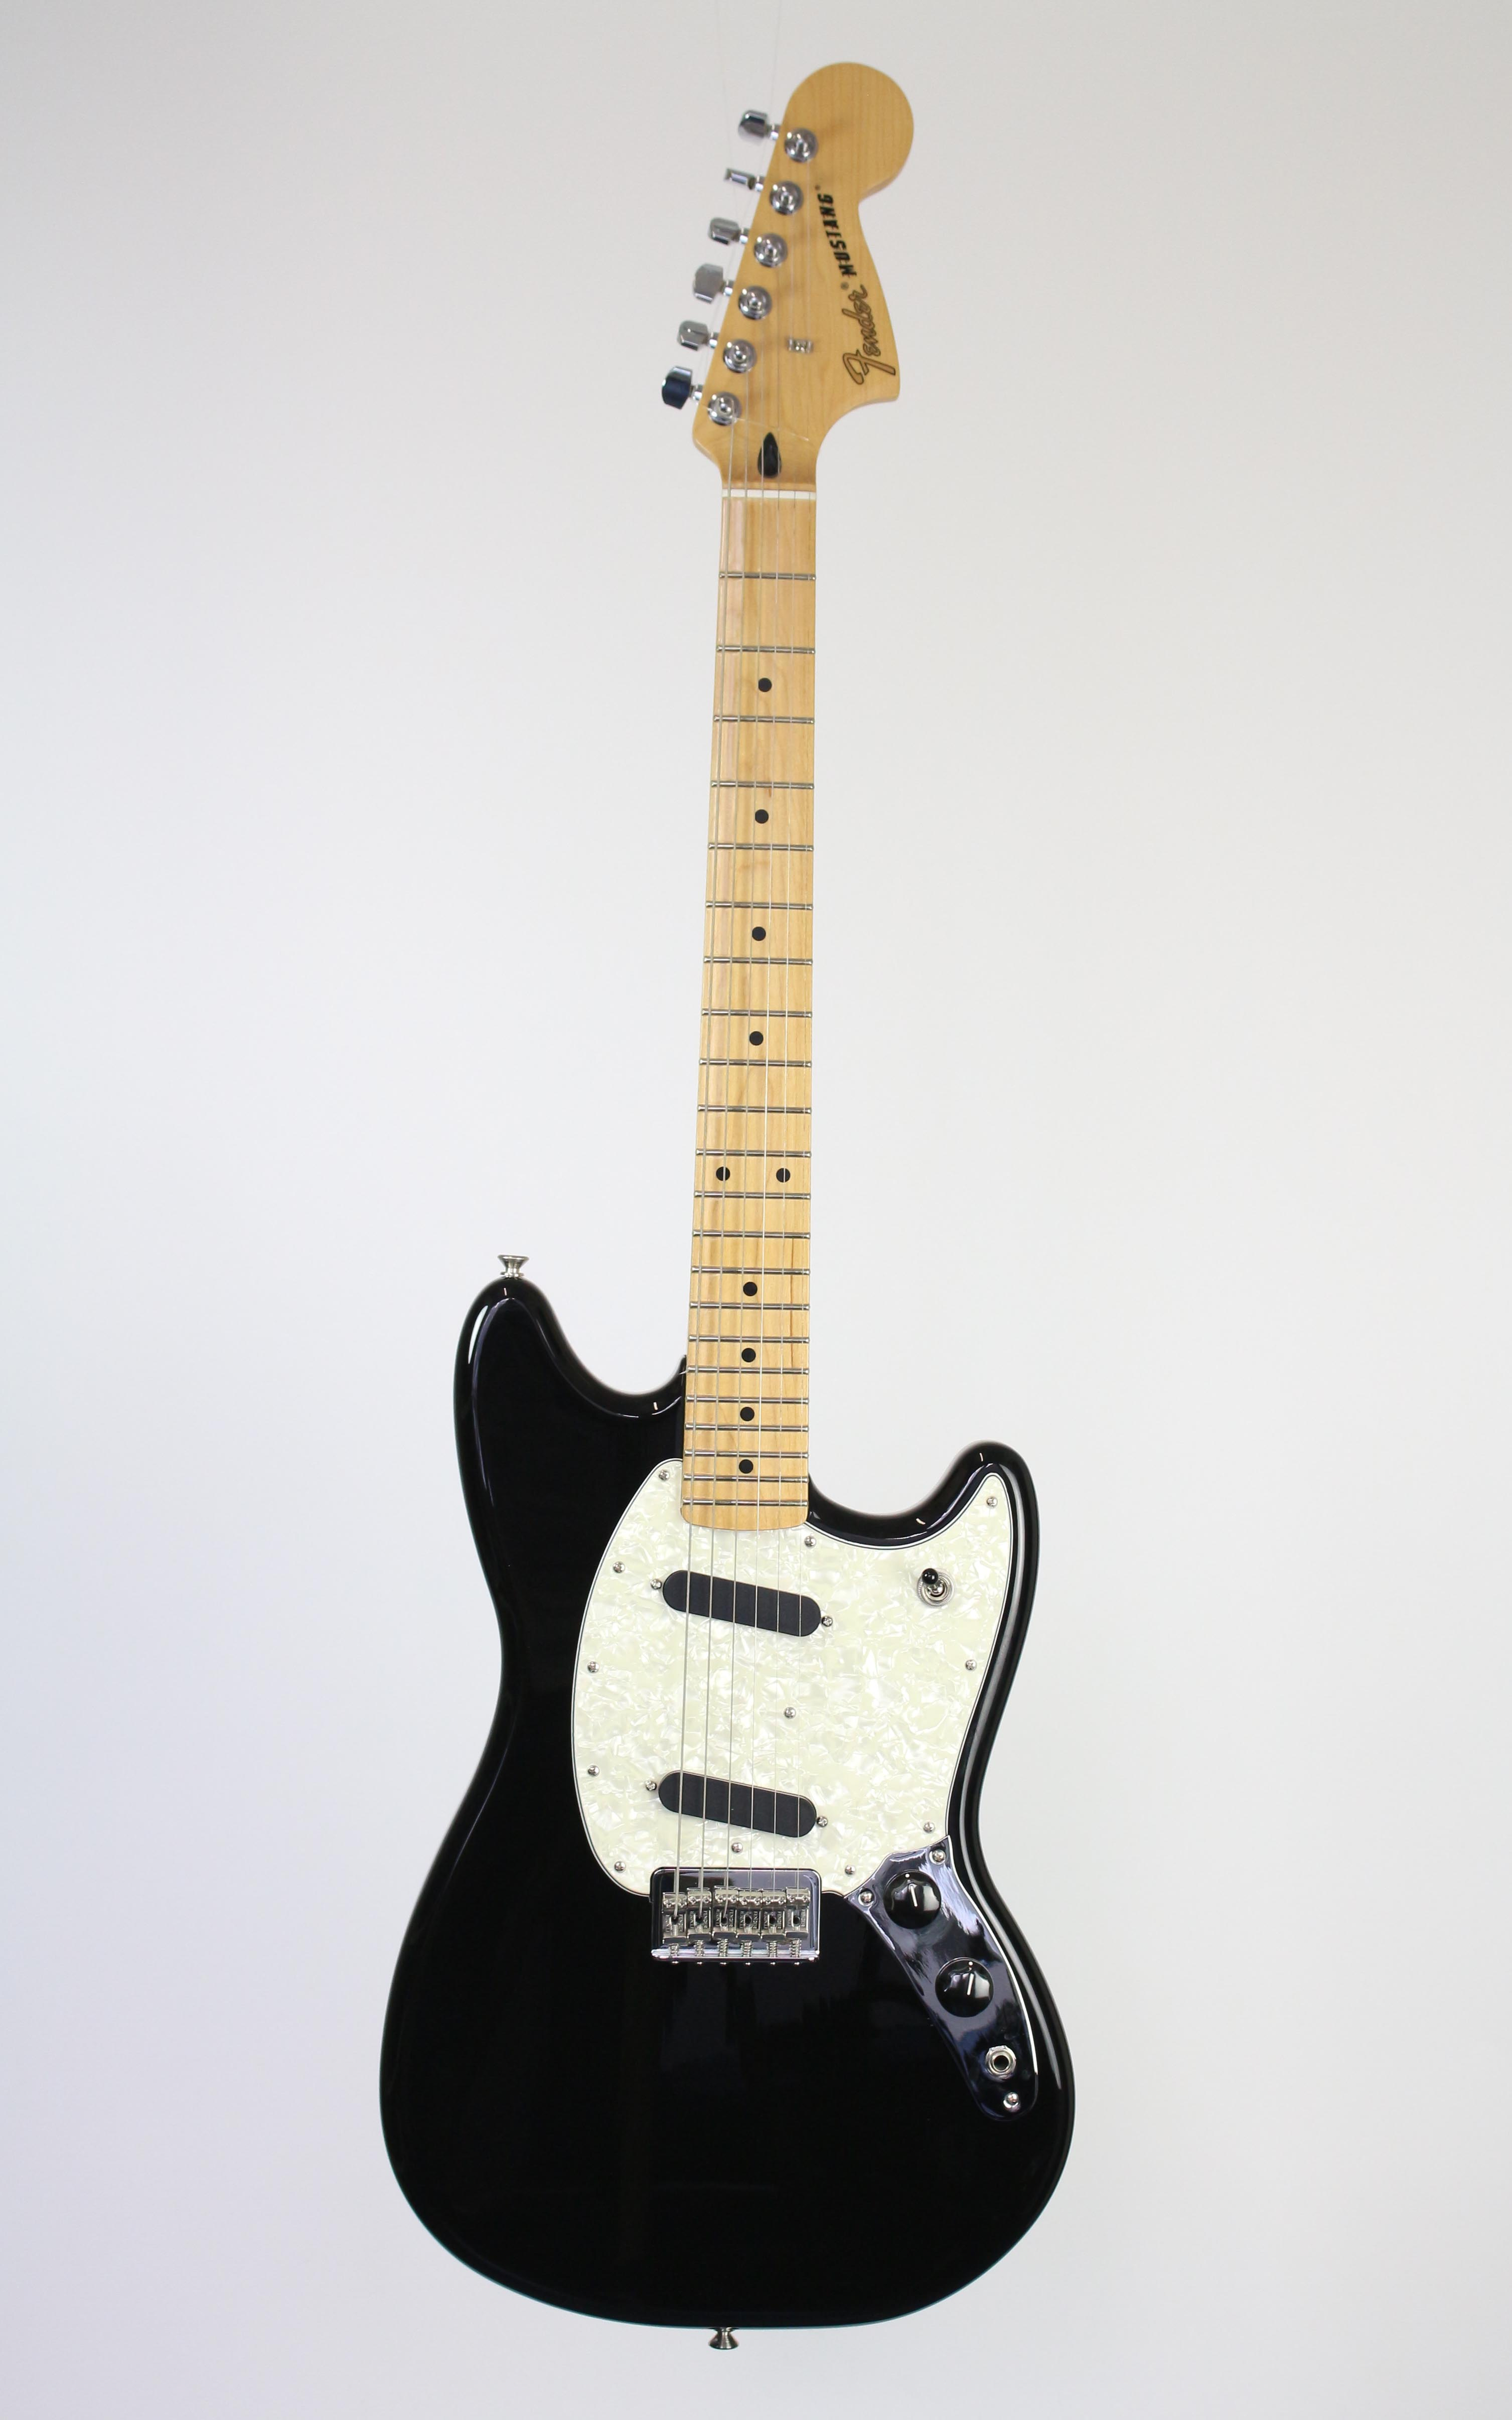 Fender - Mustang MN Black - Gitarren - E-Gitarren | MUSIK BERTRAM Deutschland Freiburg